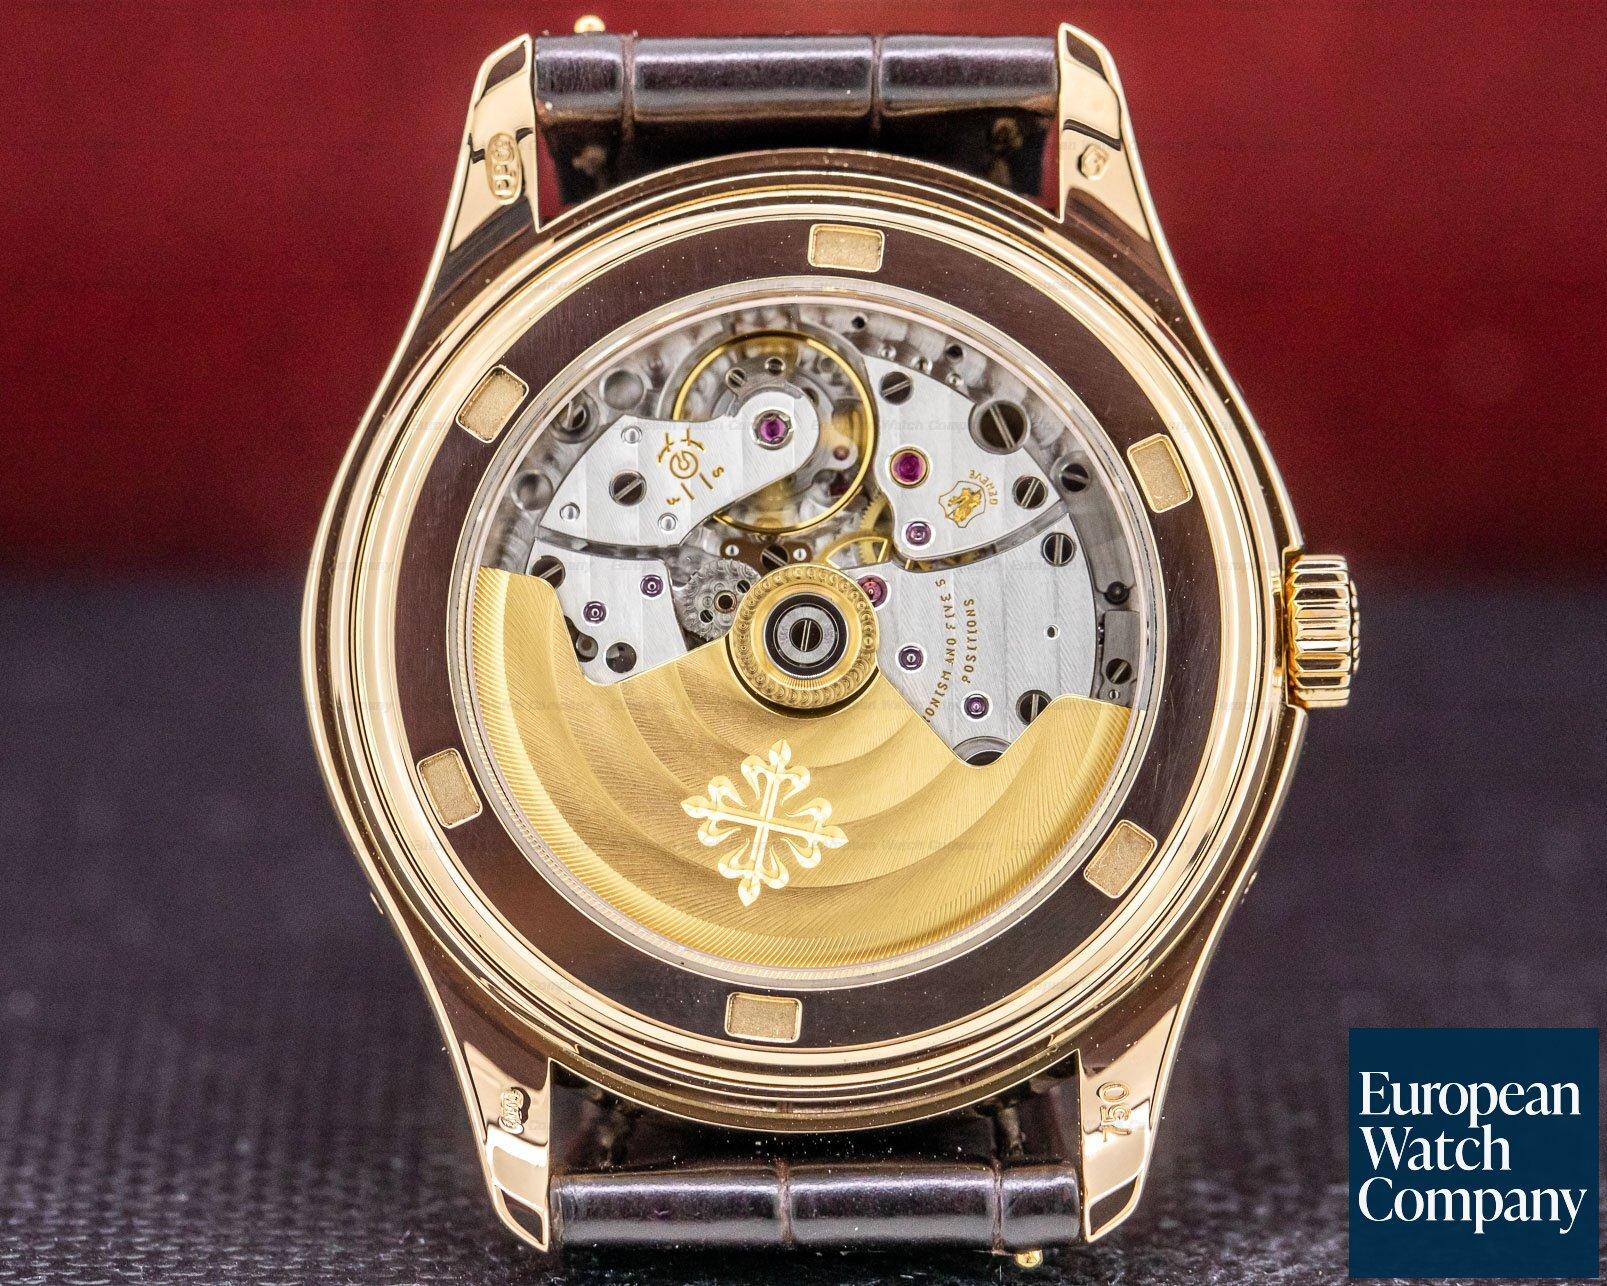 Patek Philippe 5146R Annual Calendar 18K Rose Gold Porcelain Dial 39MM